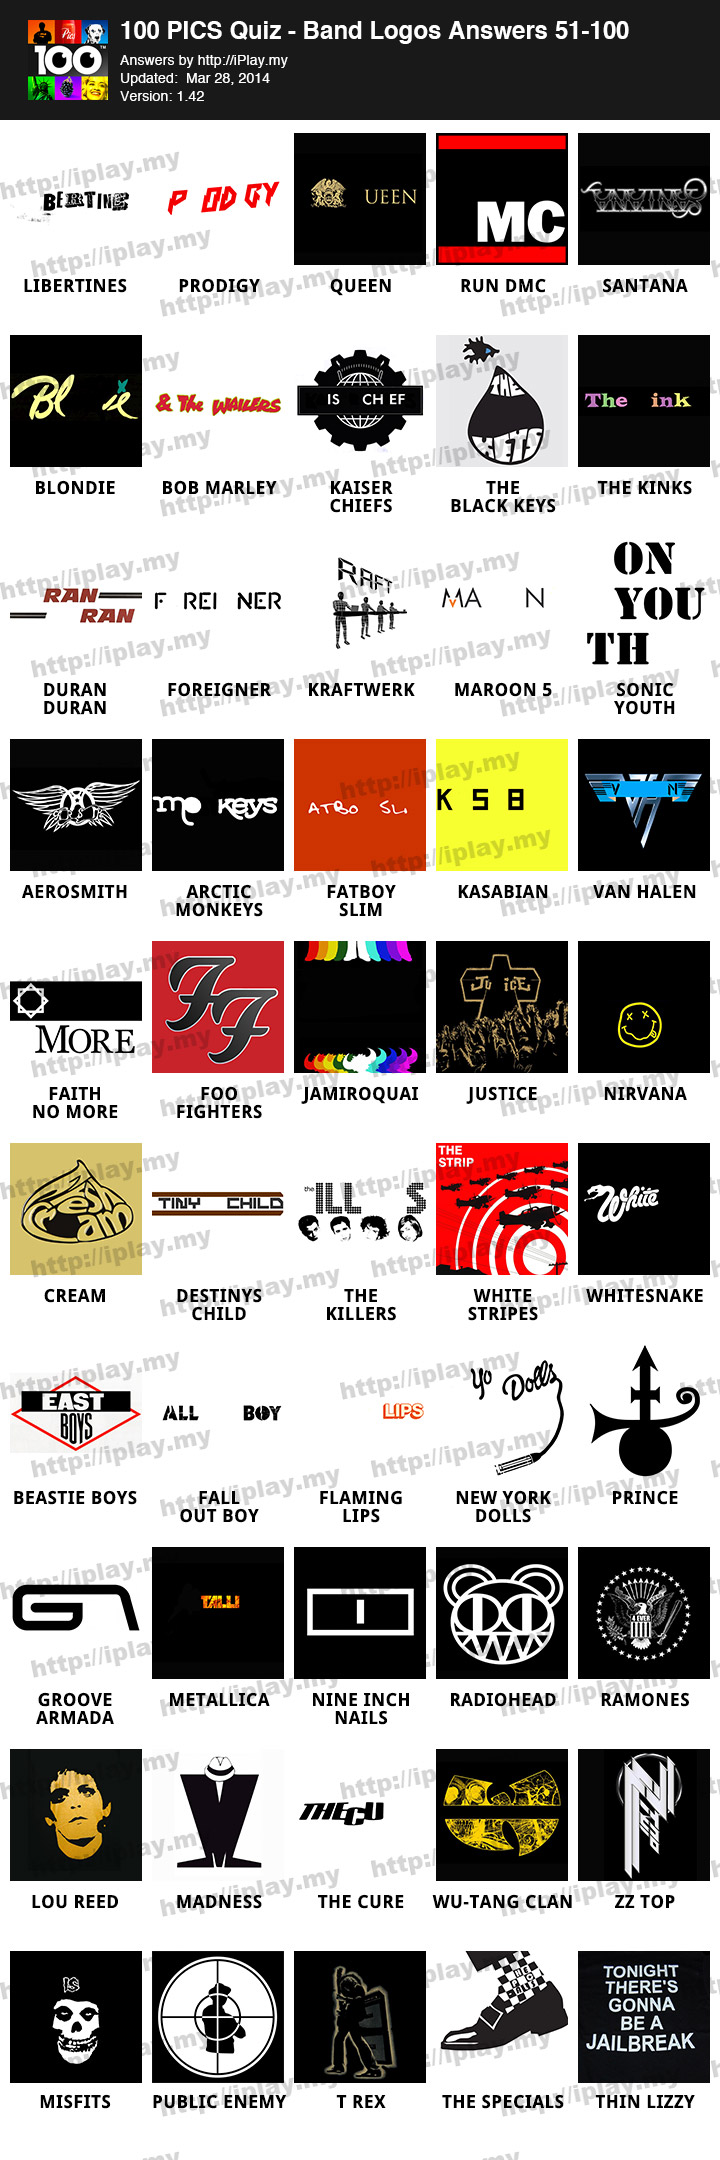 100 Pics Logo 51 : Logos, Answers, IPlay.my